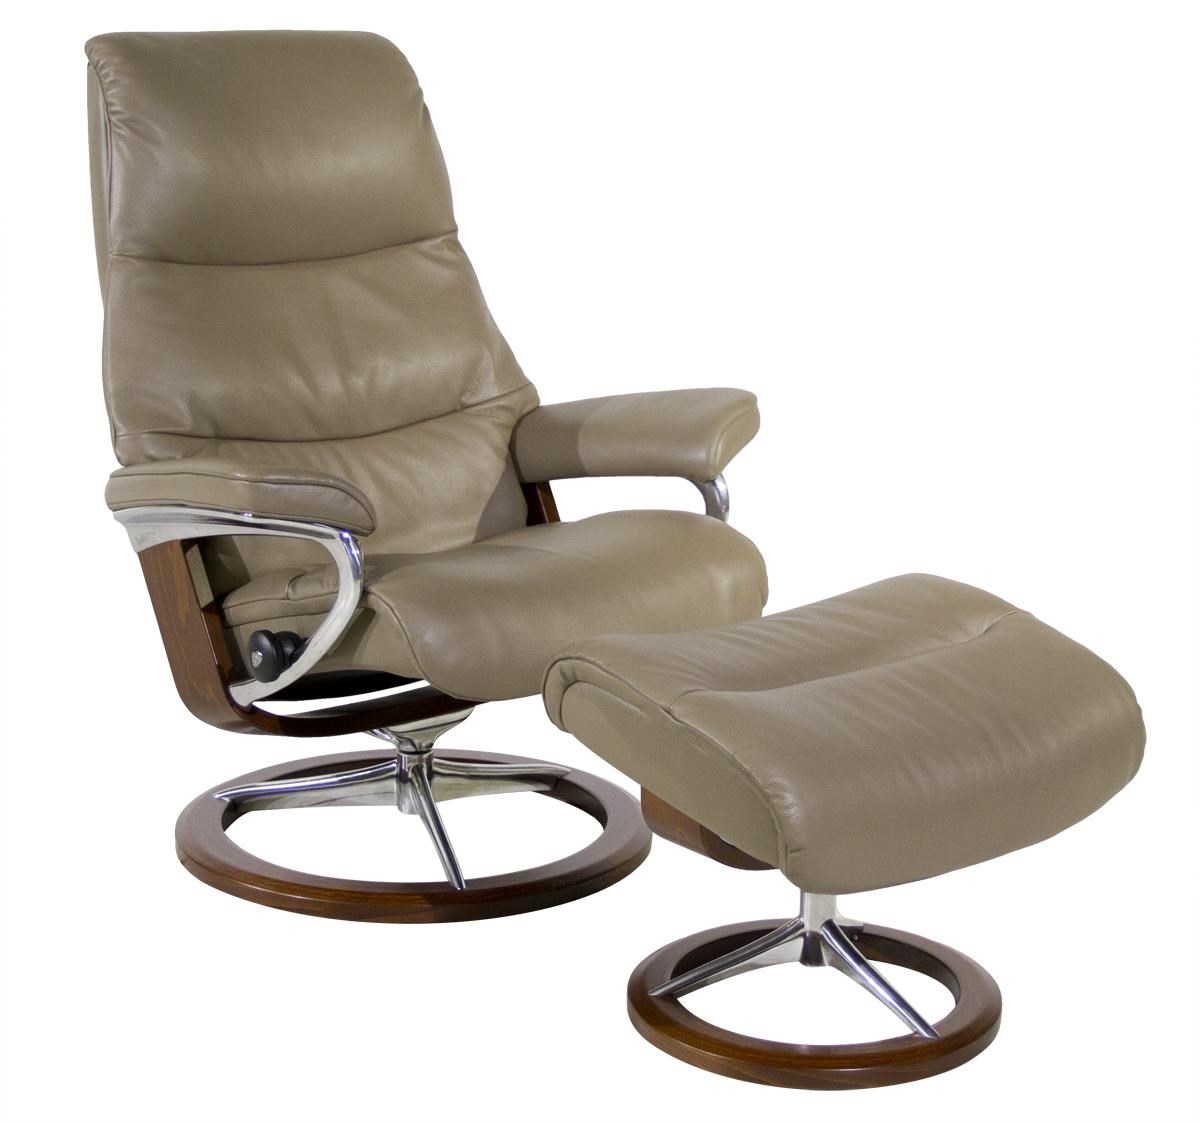 Stressless By Ekornes ViewMedium Stressless Chair U0026 Ottoman ...